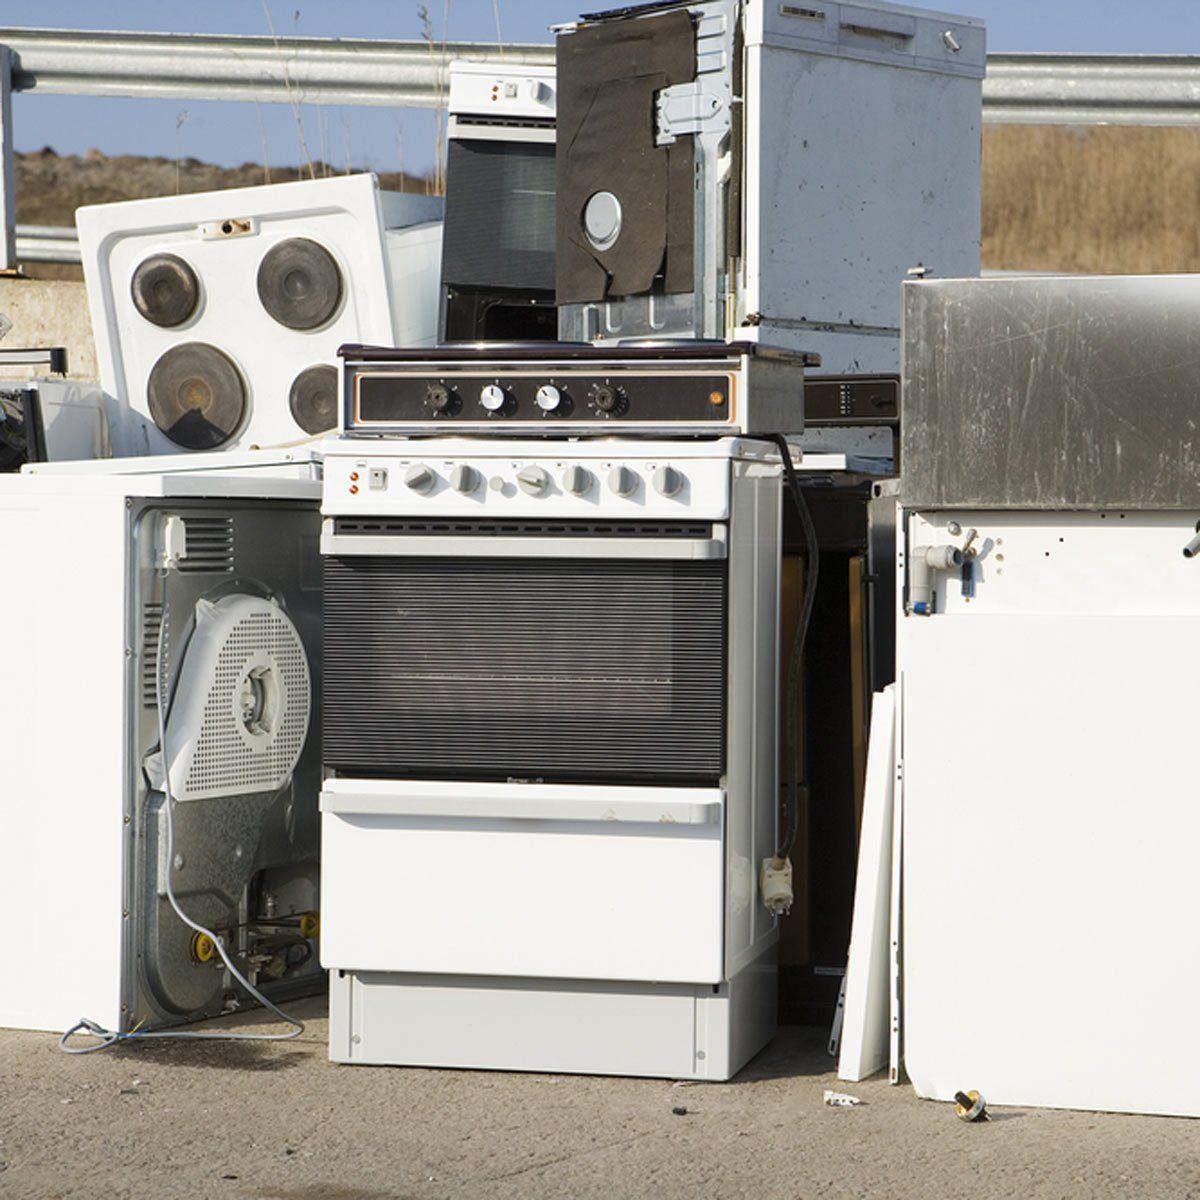 dfh2_shutterstock_94804468 home appliance repair stove oven ewaste